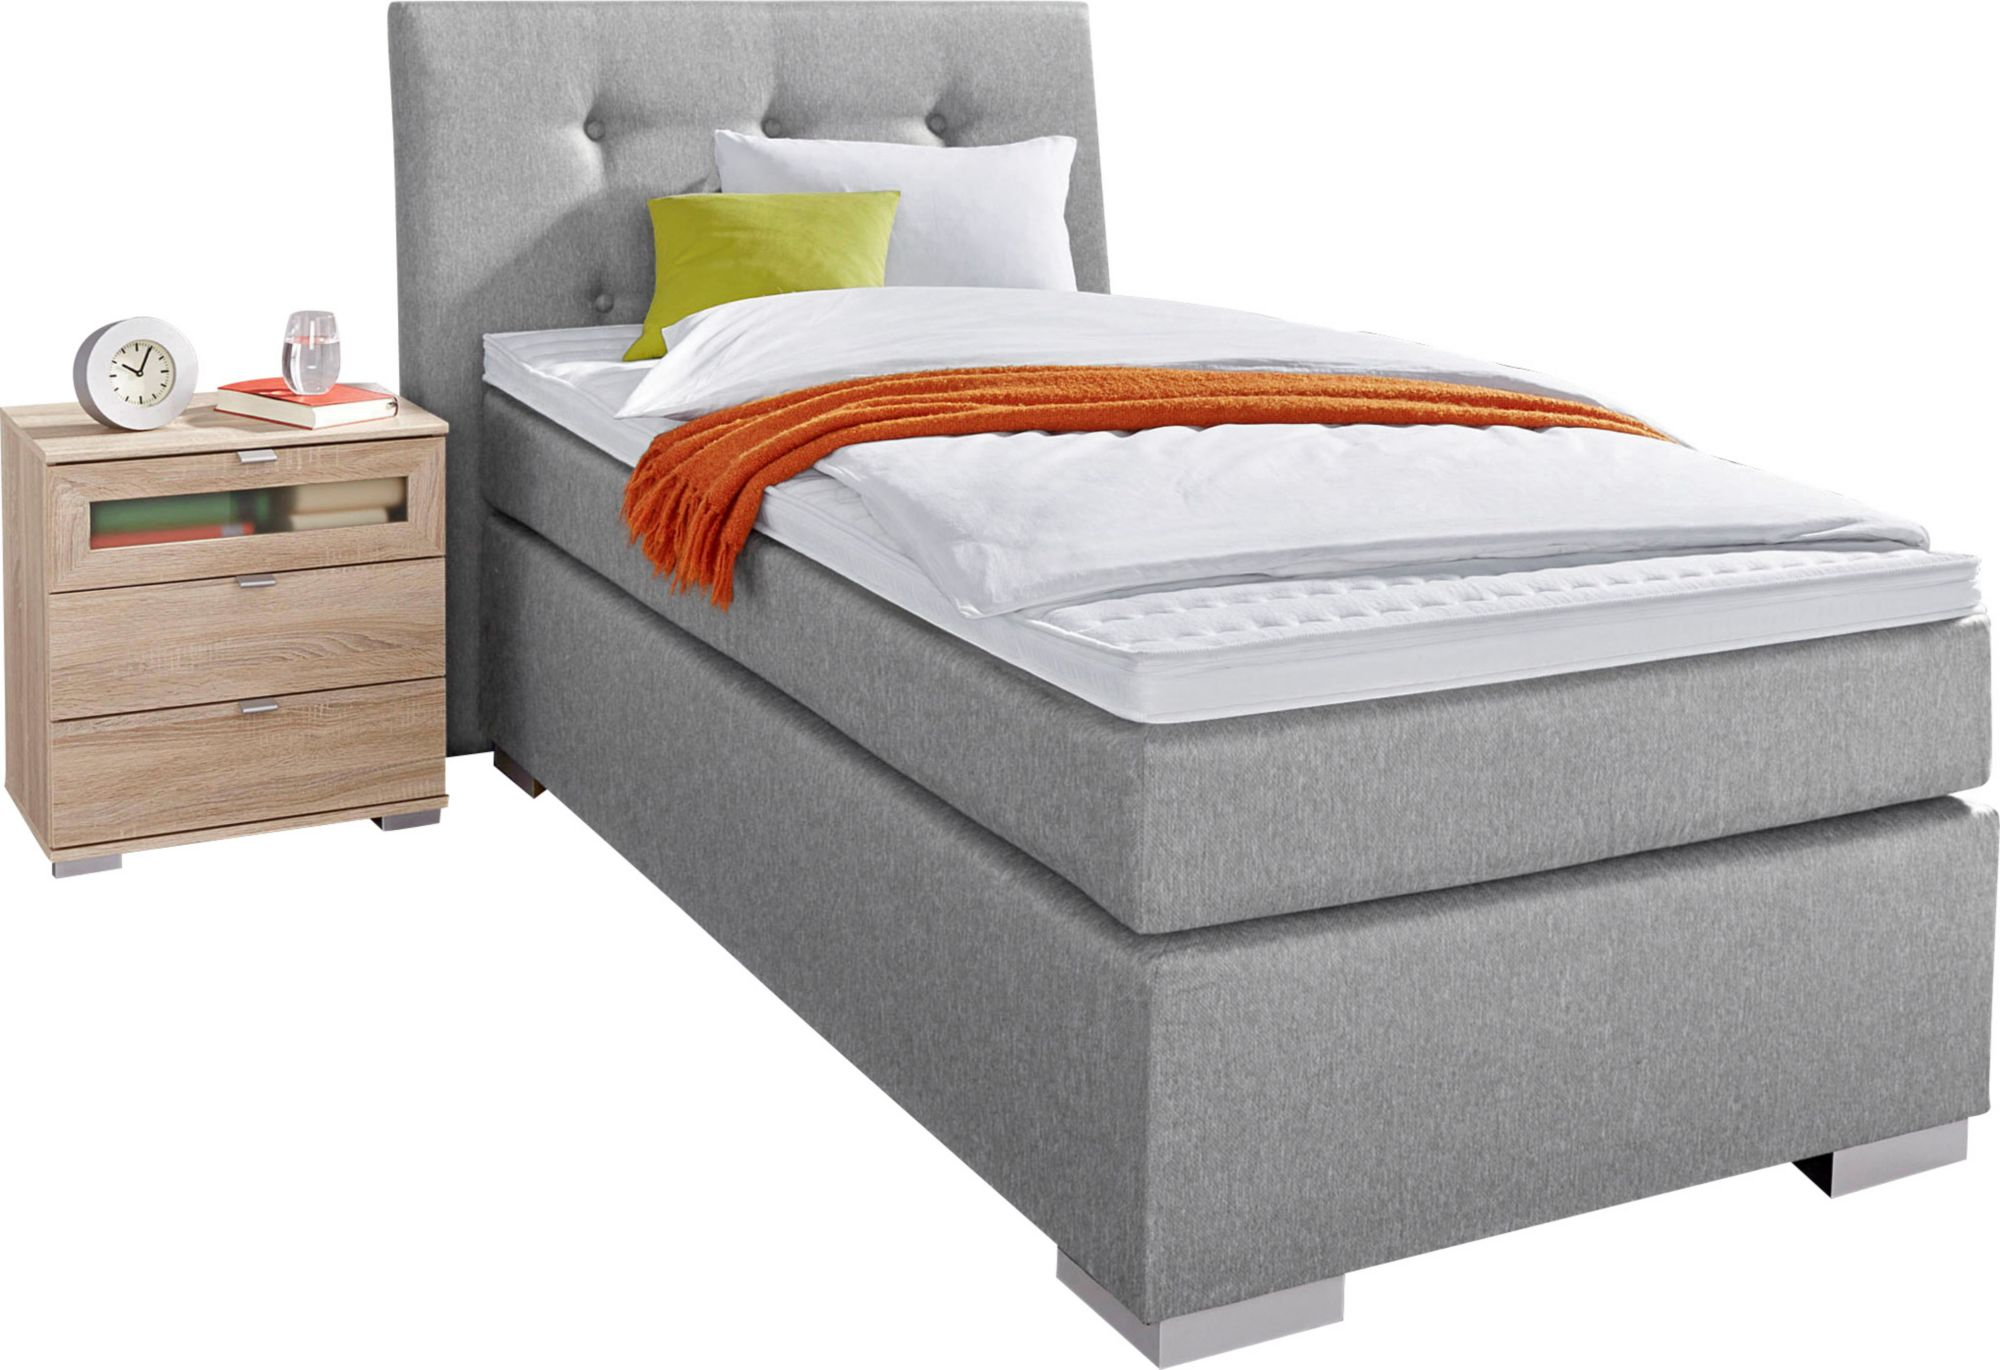 bettgestelle im schwab online shop m bel betten. Black Bedroom Furniture Sets. Home Design Ideas